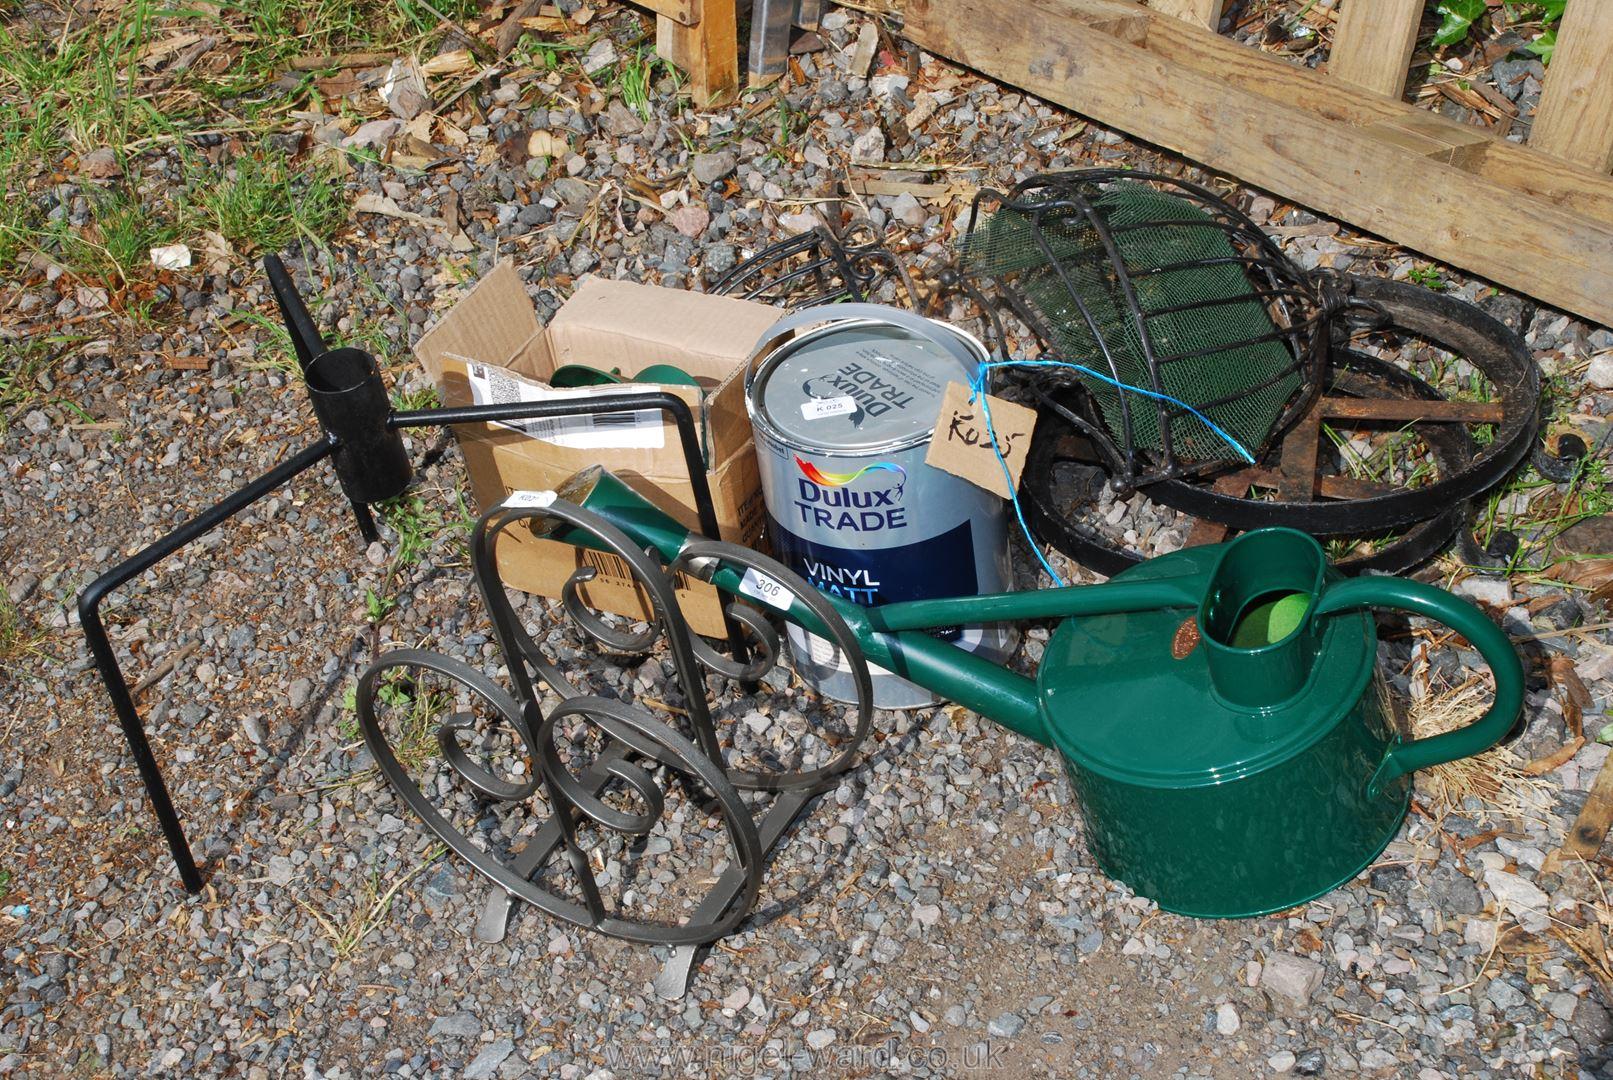 A metal watering can, Christmas tree stand, squirrel proof bird feeders, metalware, etc.